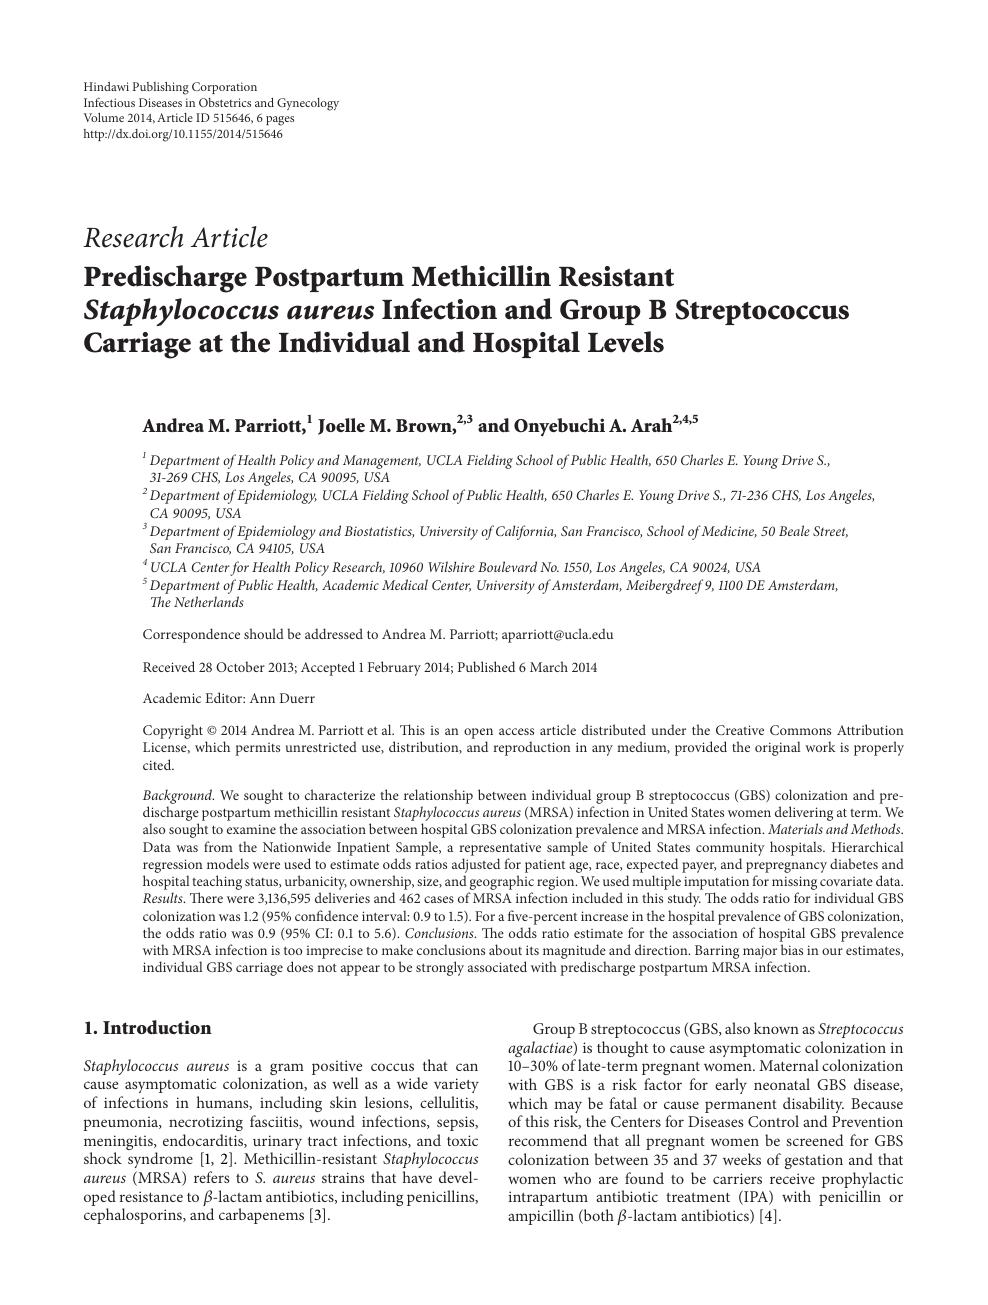 Predischarge Postpartum Methicillin Resistant Staphylococcus aureus